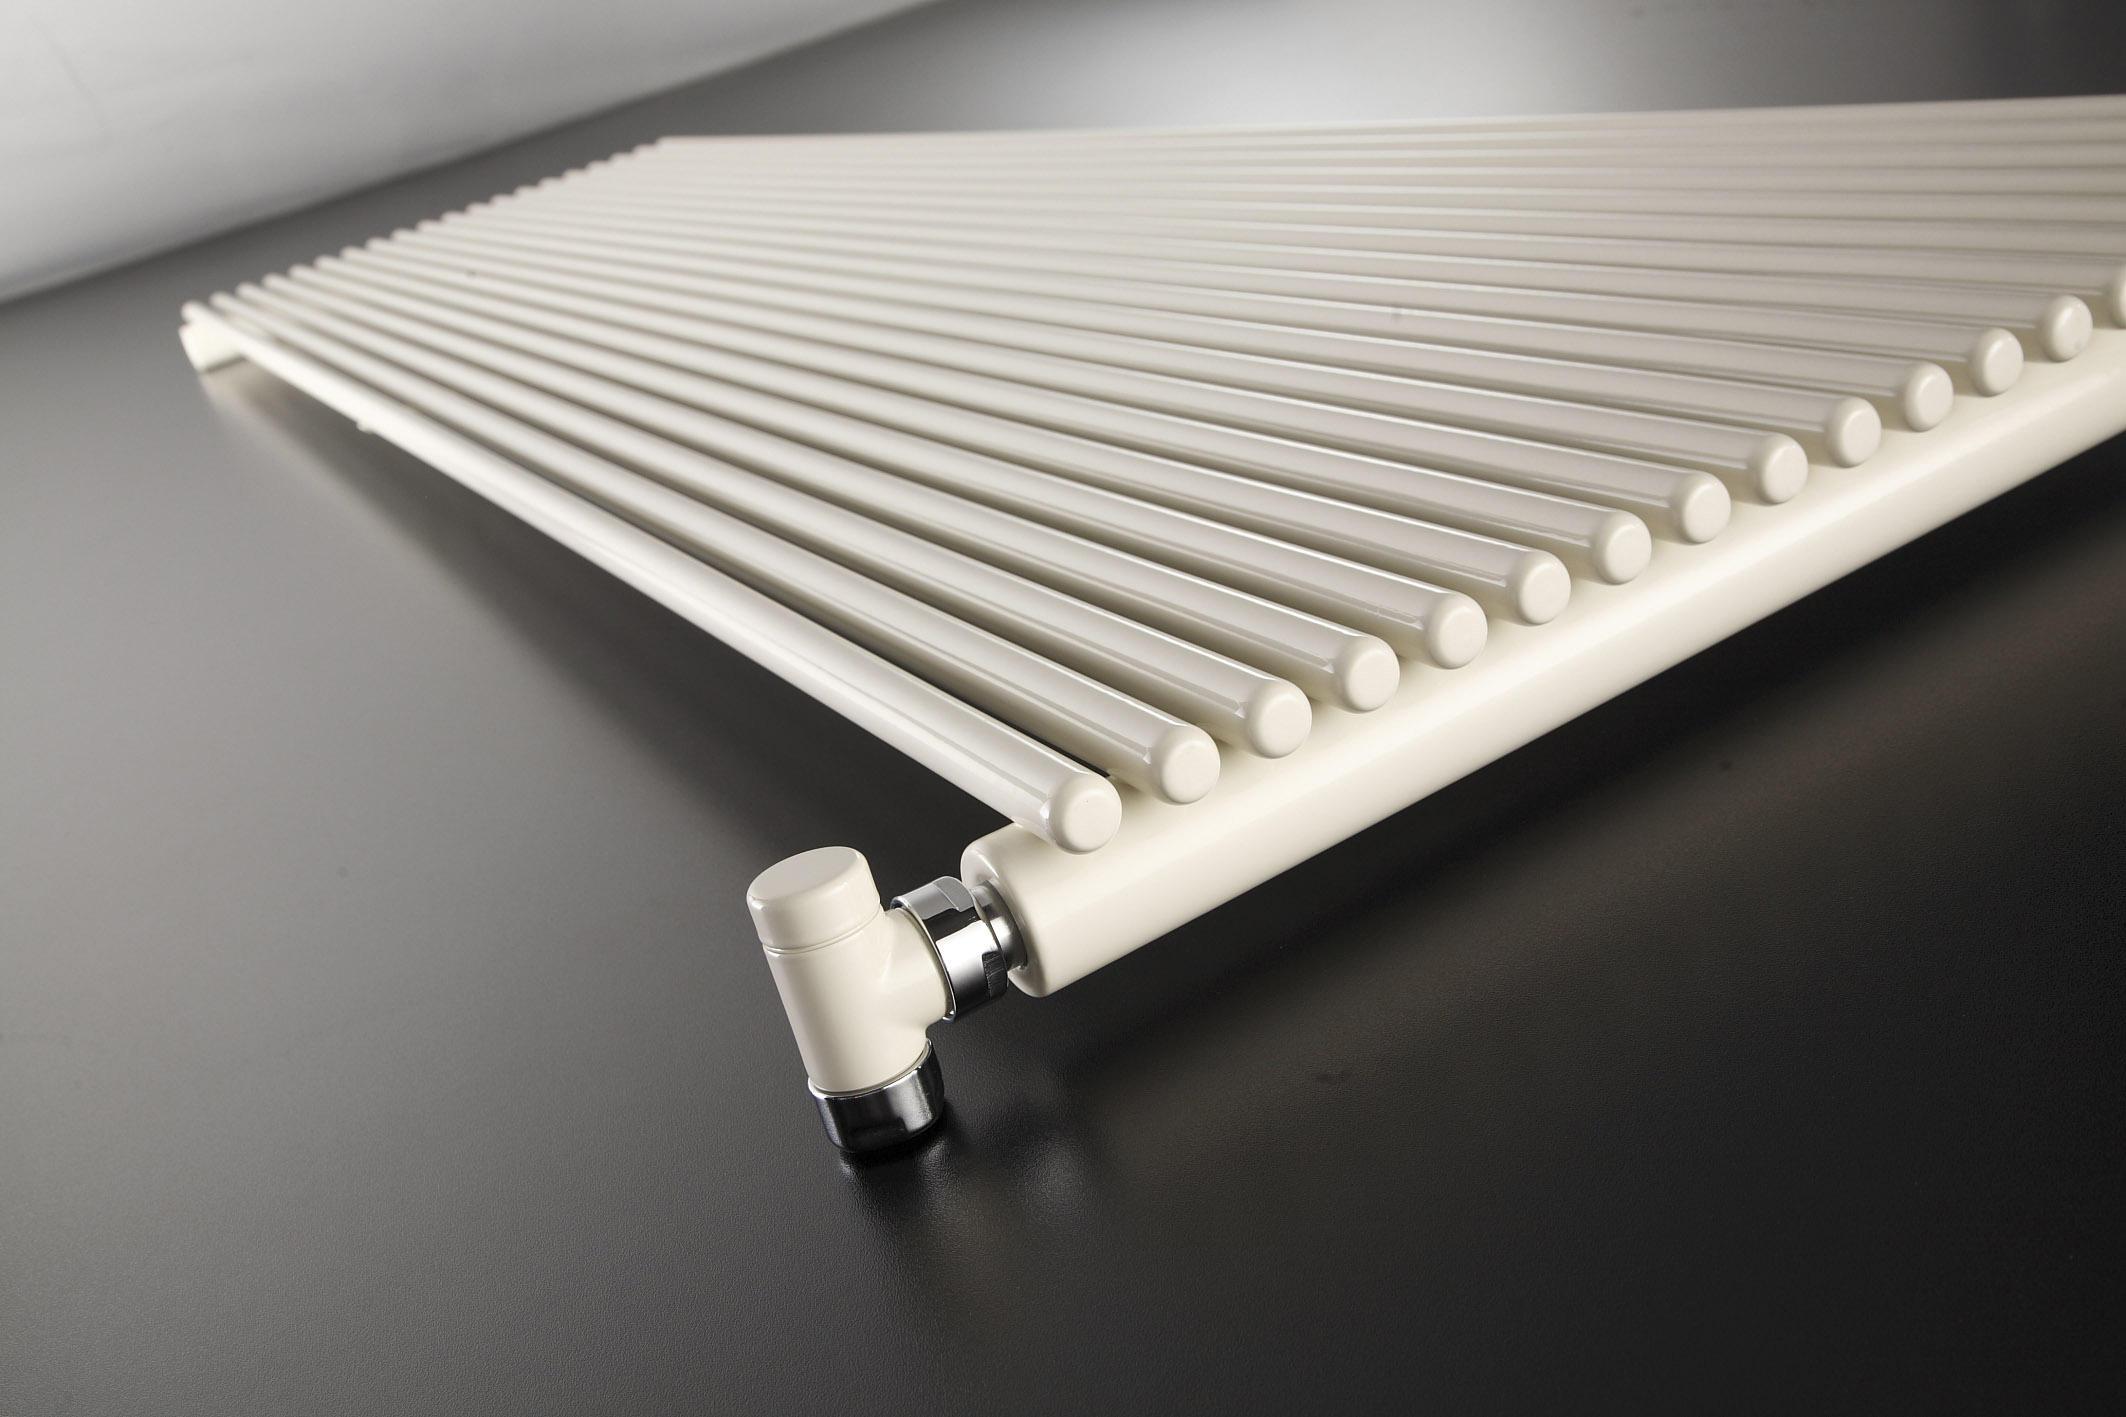 alice vertical radiatoren von cordivari architonic. Black Bedroom Furniture Sets. Home Design Ideas